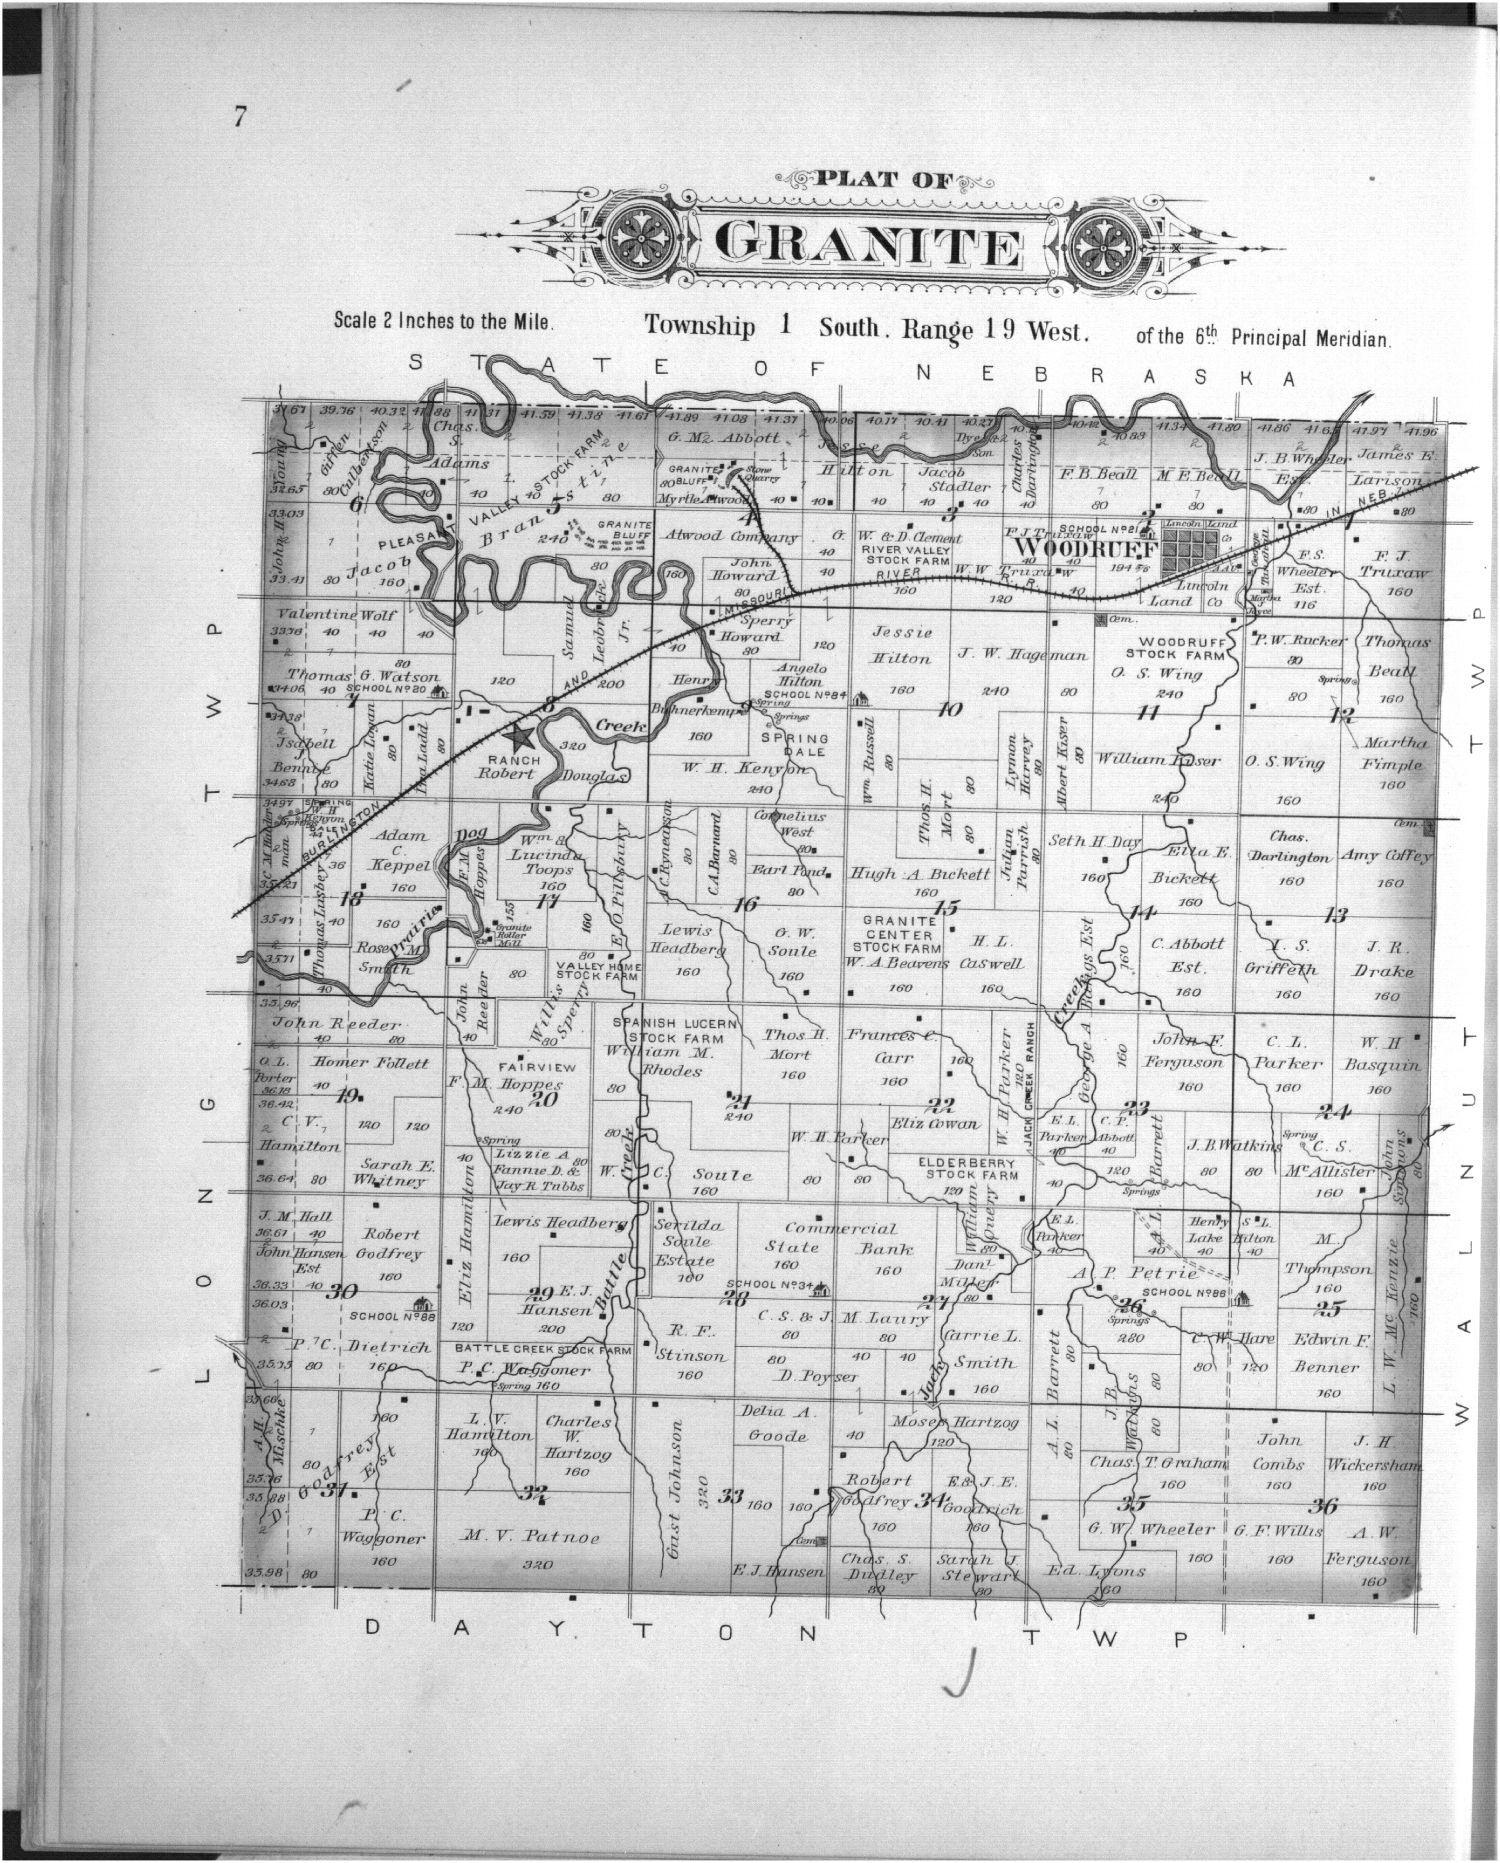 Plat book, Phillips County, Kansas - 7